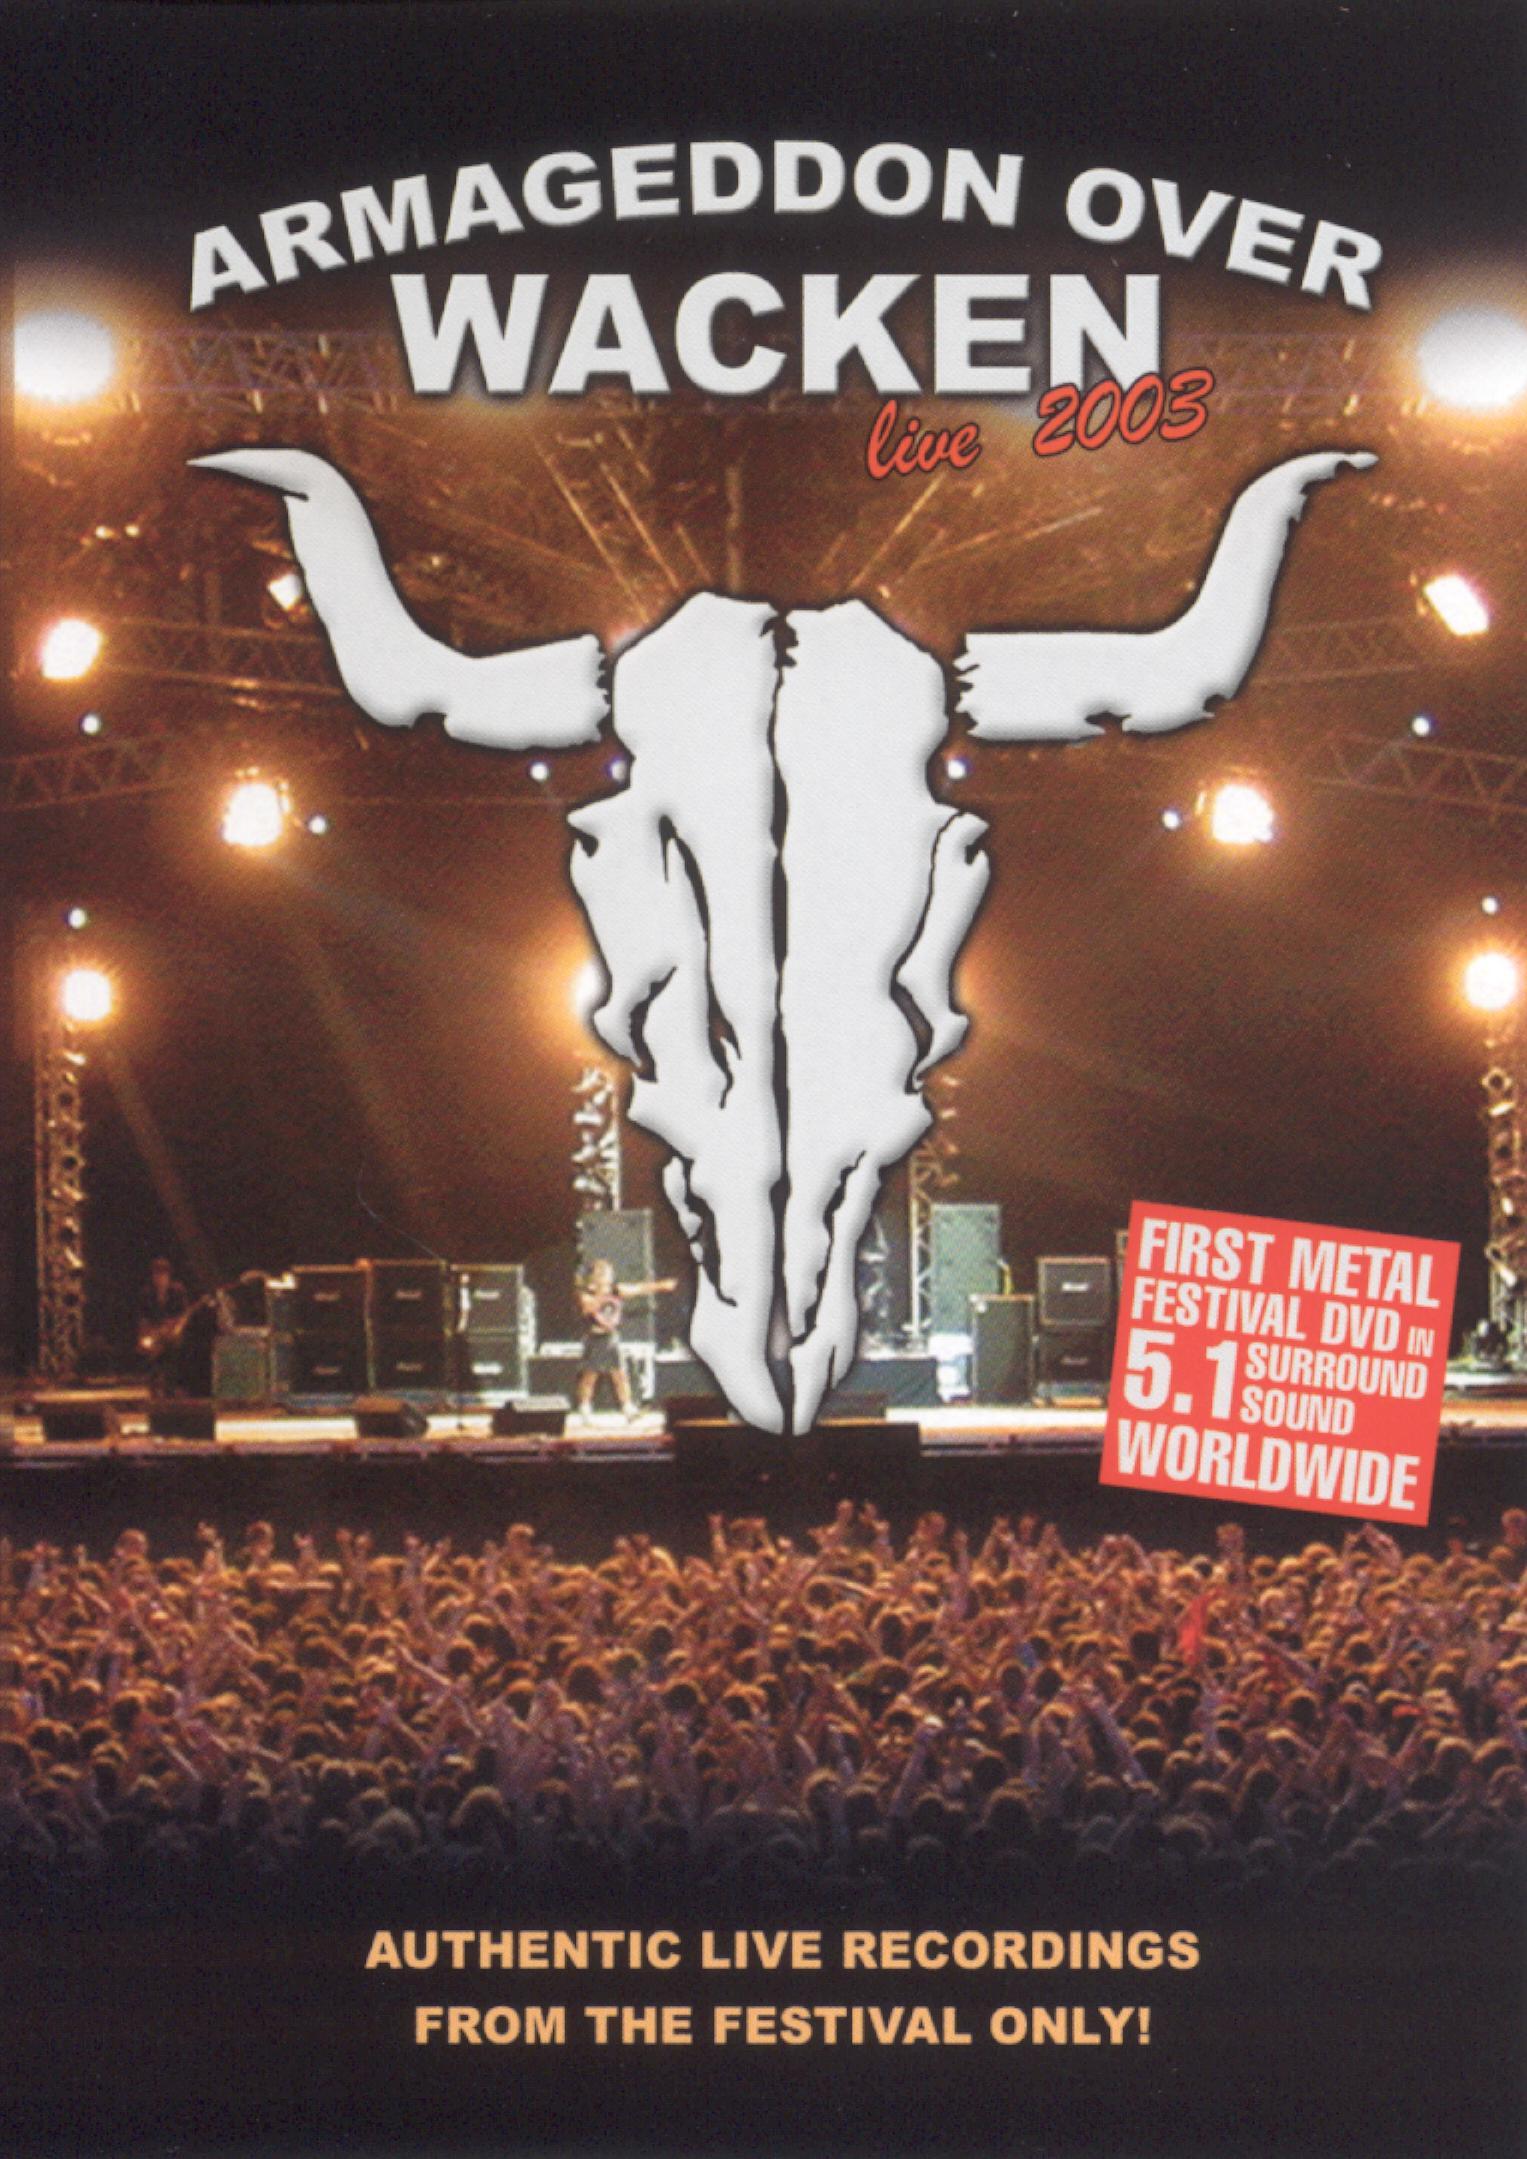 Armageddon Over Wacken: Live 2003